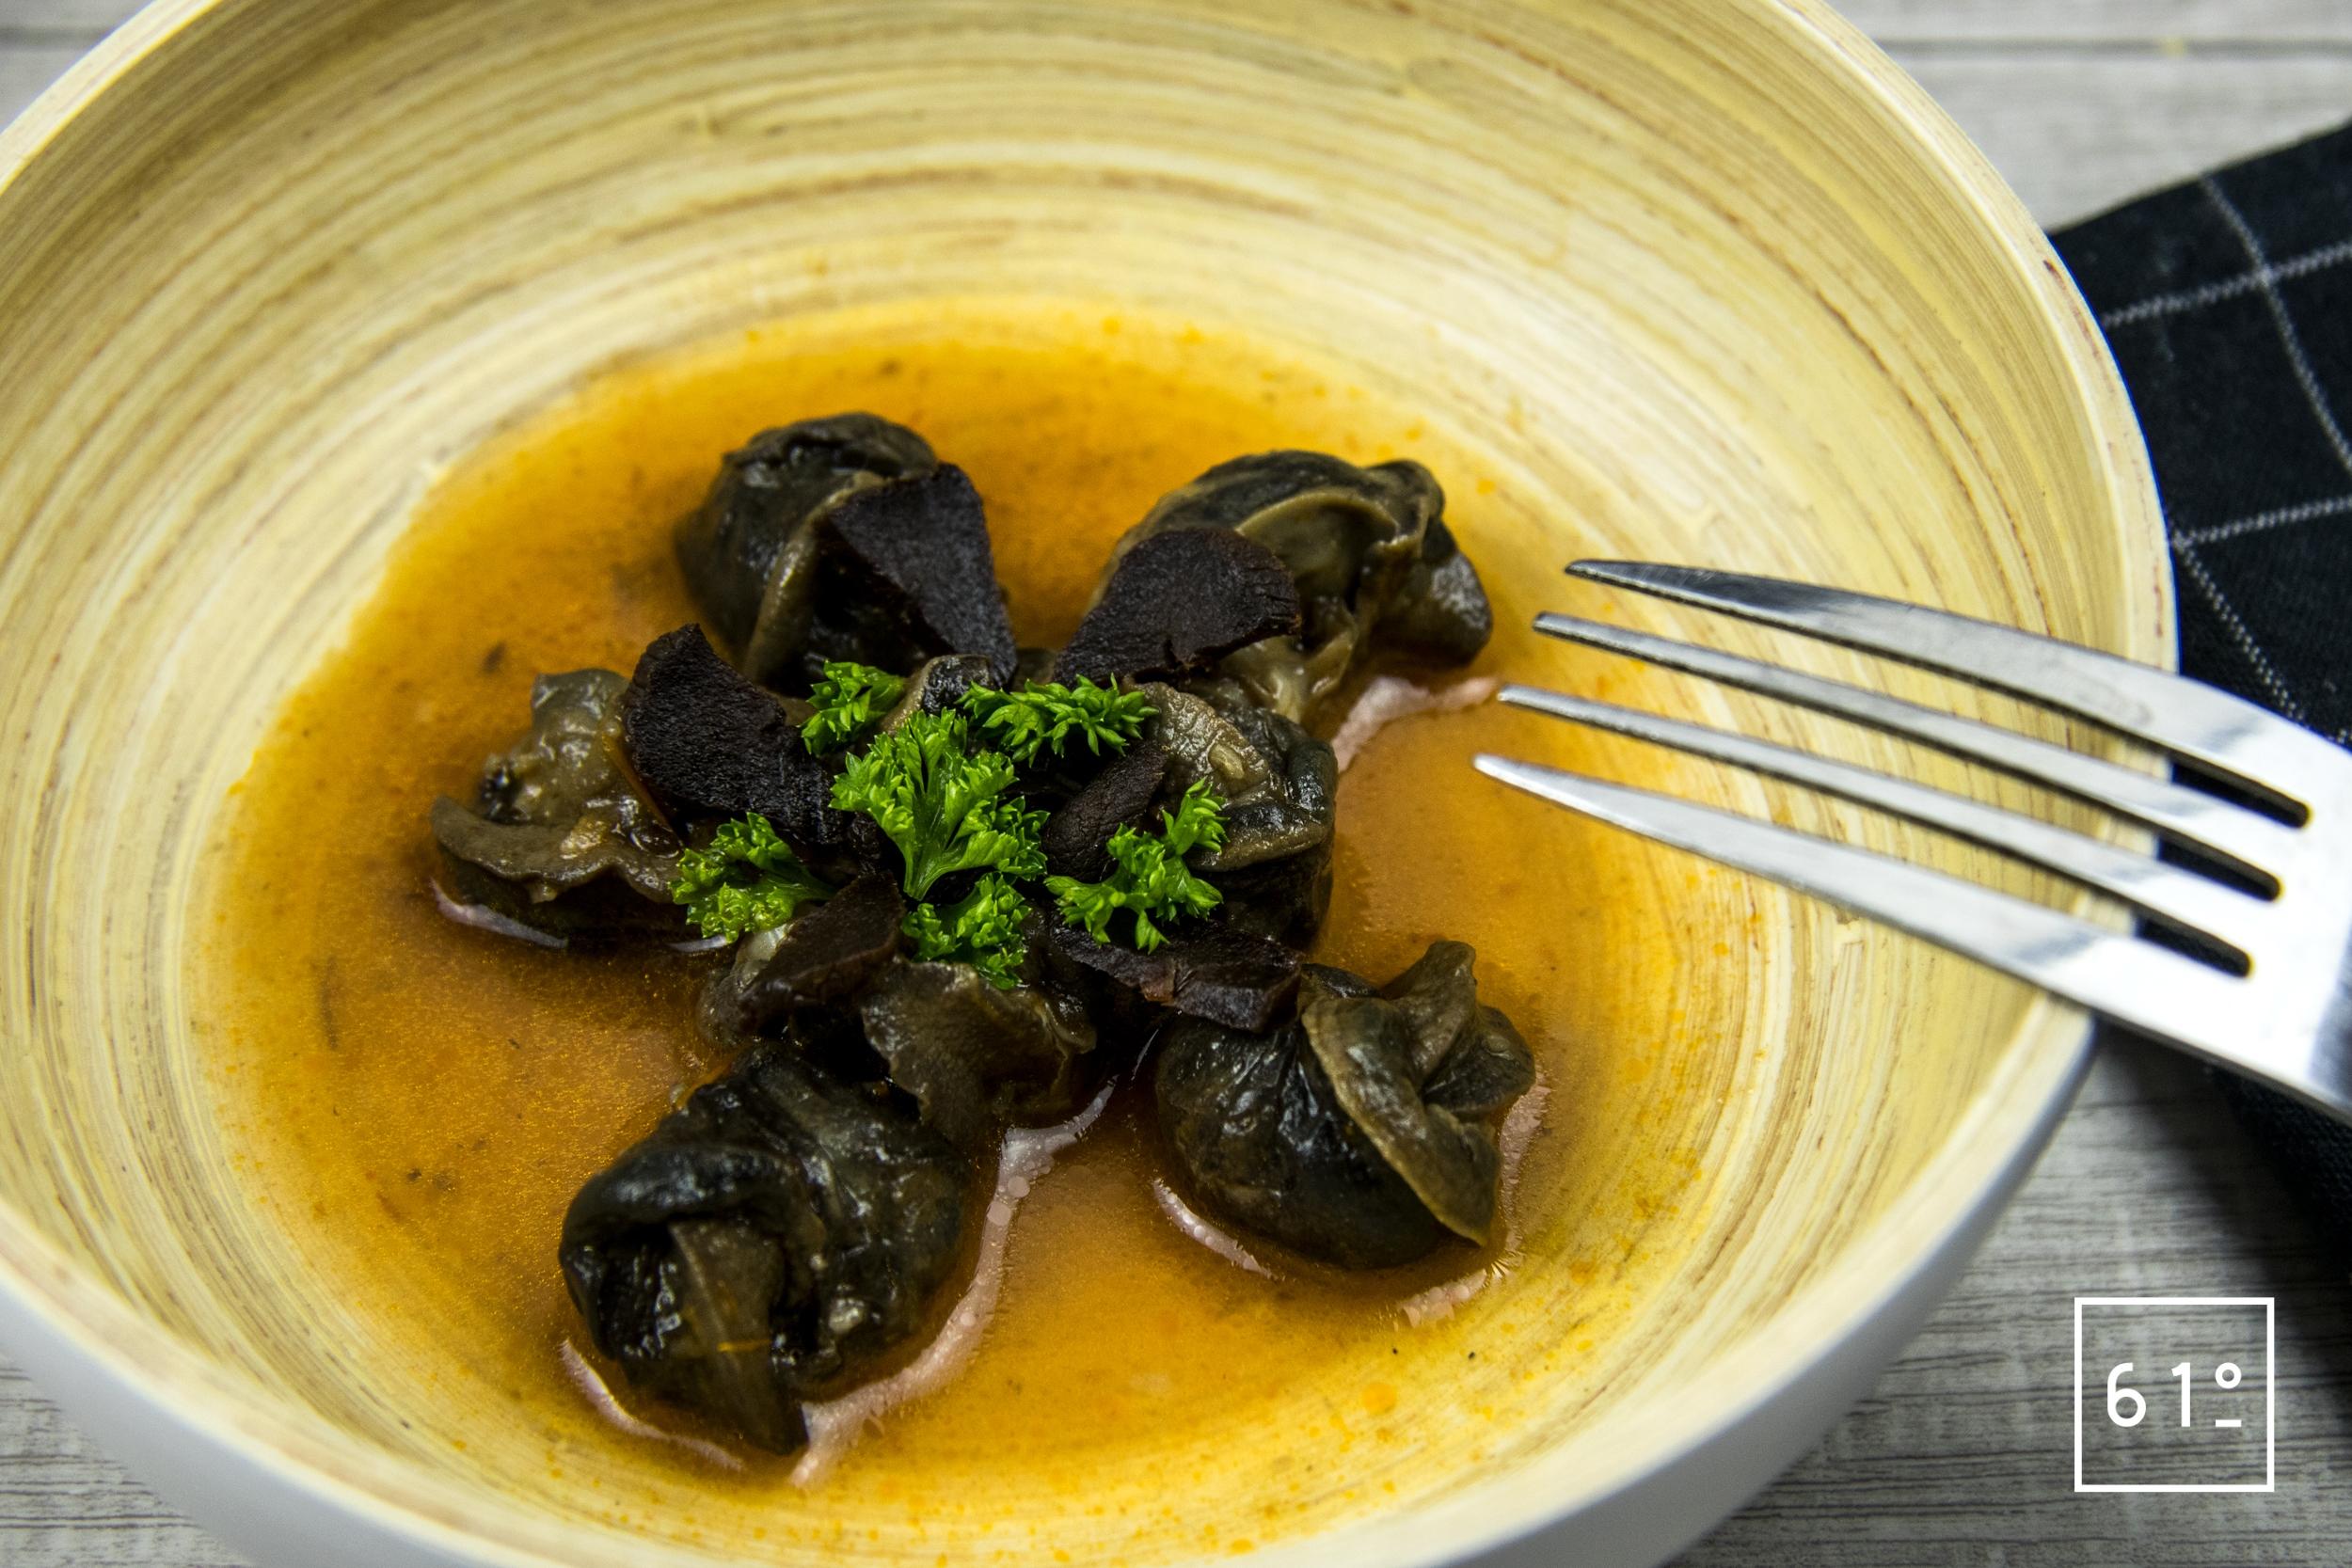 escargots l italienne relev s d ail noir recette 61 degr s. Black Bedroom Furniture Sets. Home Design Ideas